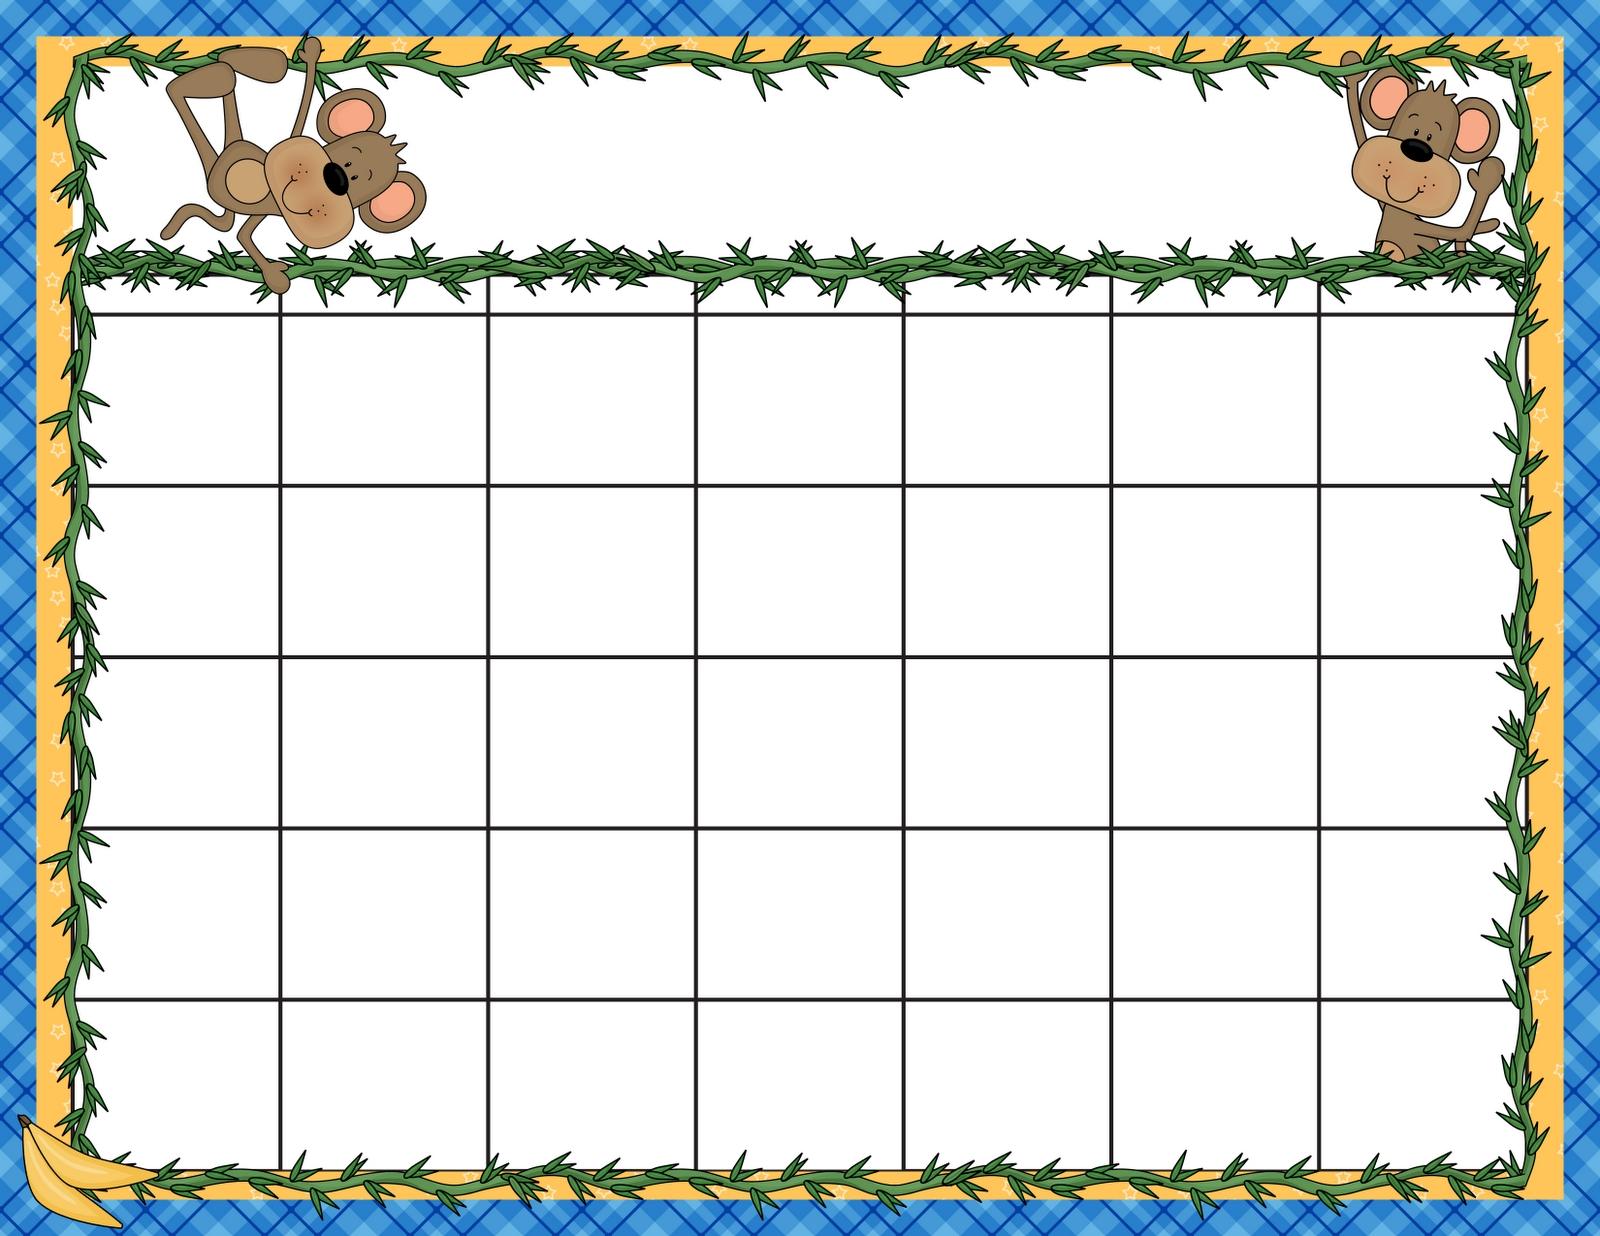 Calendar Clipart Preschool, Calendar Preschool Transparent